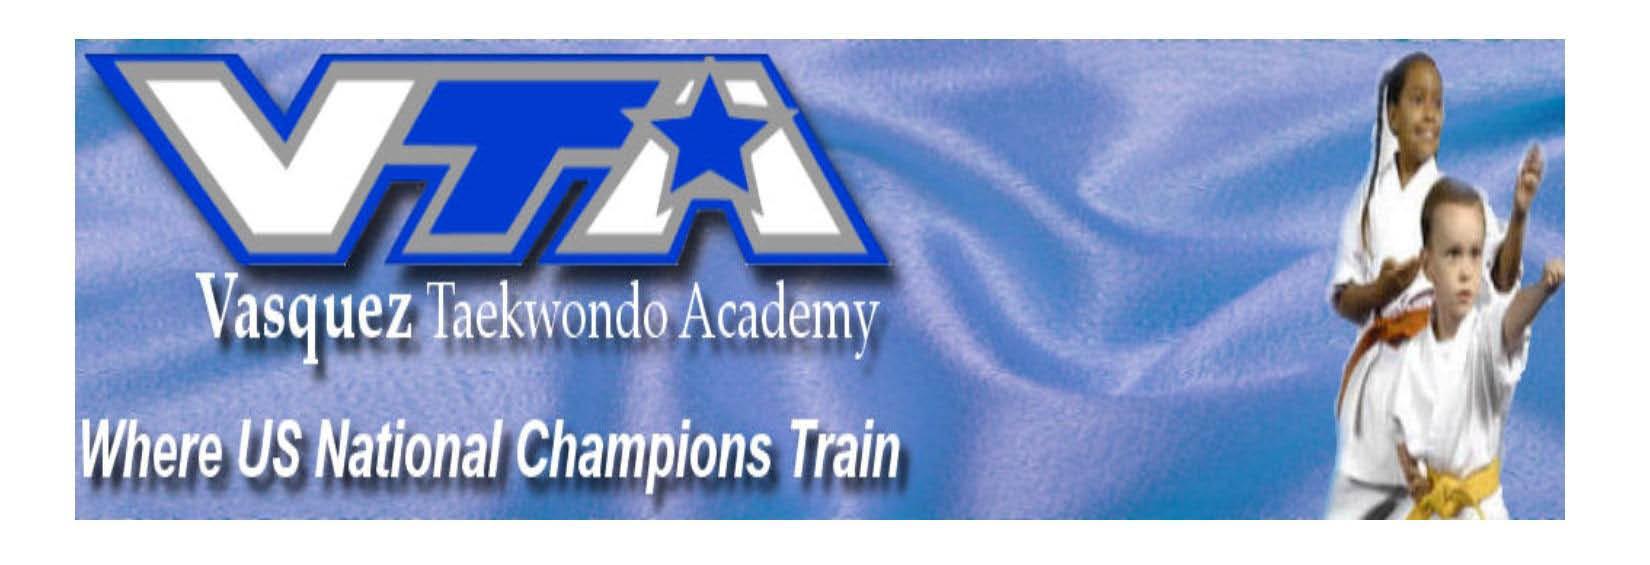 vasquez-taekwondo-academy-mckinney-tx-banner